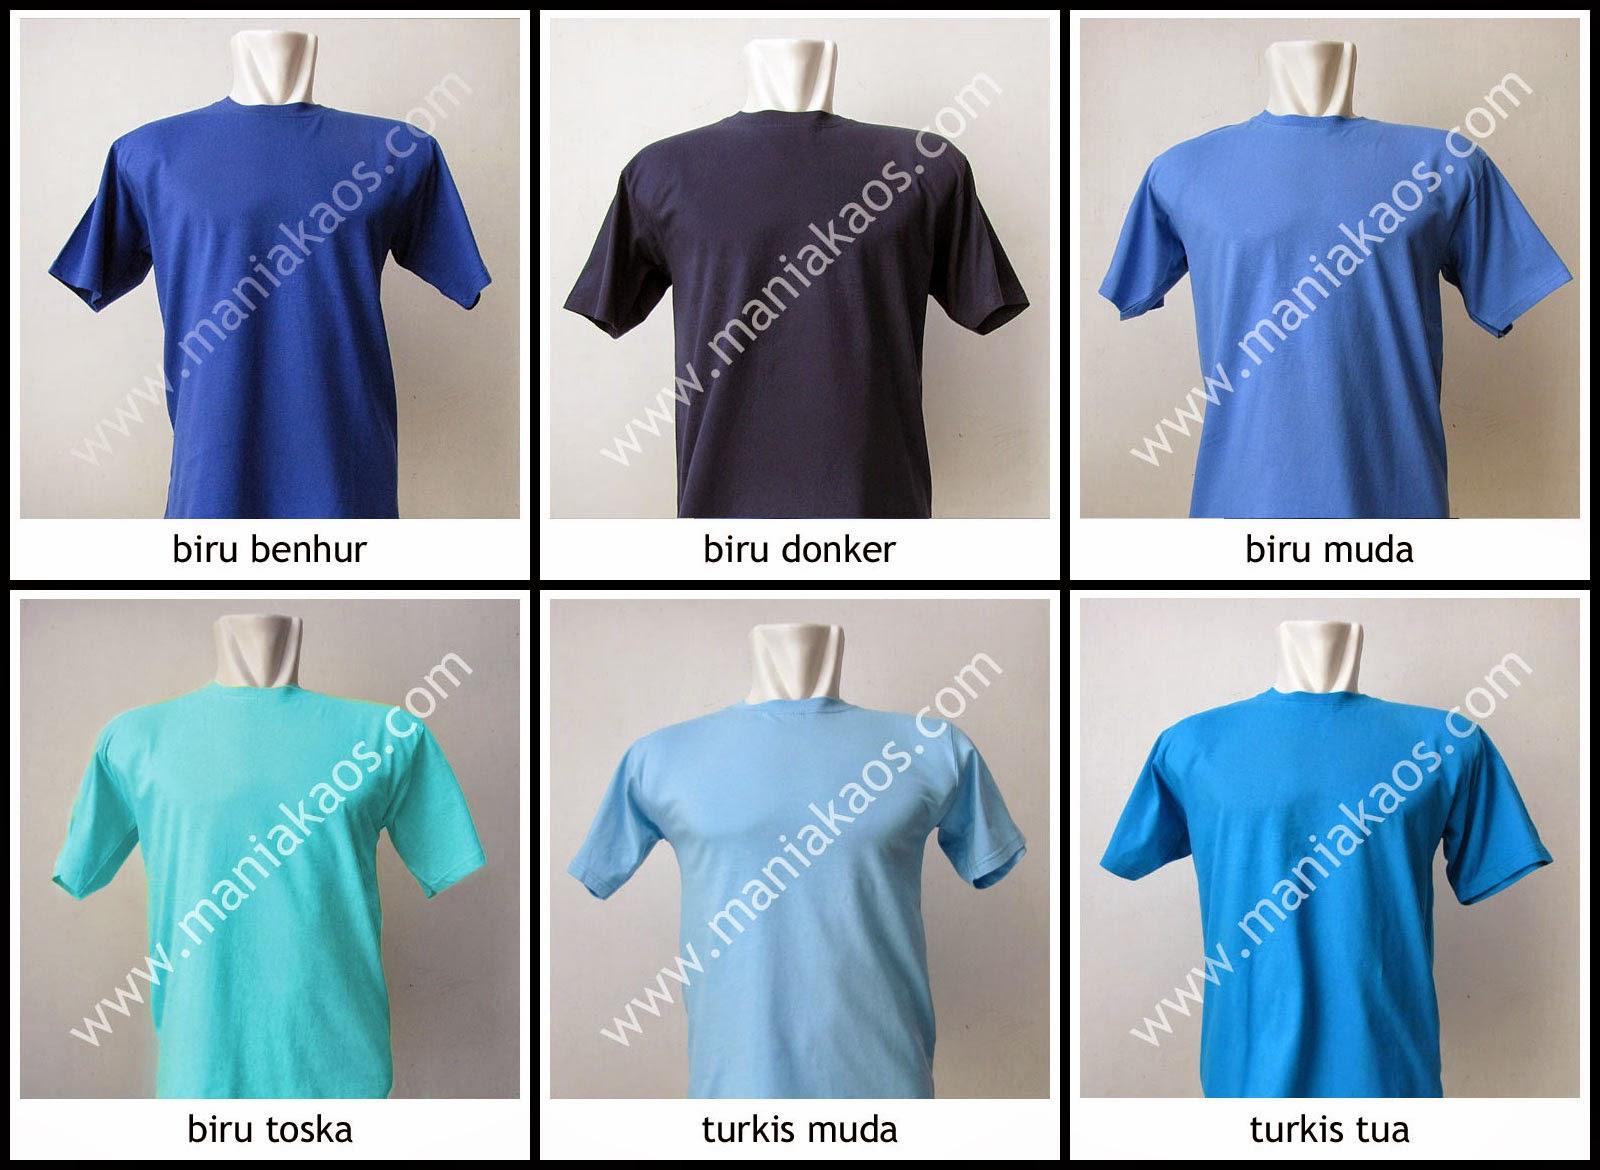 Daftar Harga Kaos Biru Muda Polos Terbaru 2018 Hijab Instan Najwa Jilbab Katun Tc Premium Murah Standar Distro Bahan Asli Salah Satu Kelebihan Kami Adalah Tersedianya